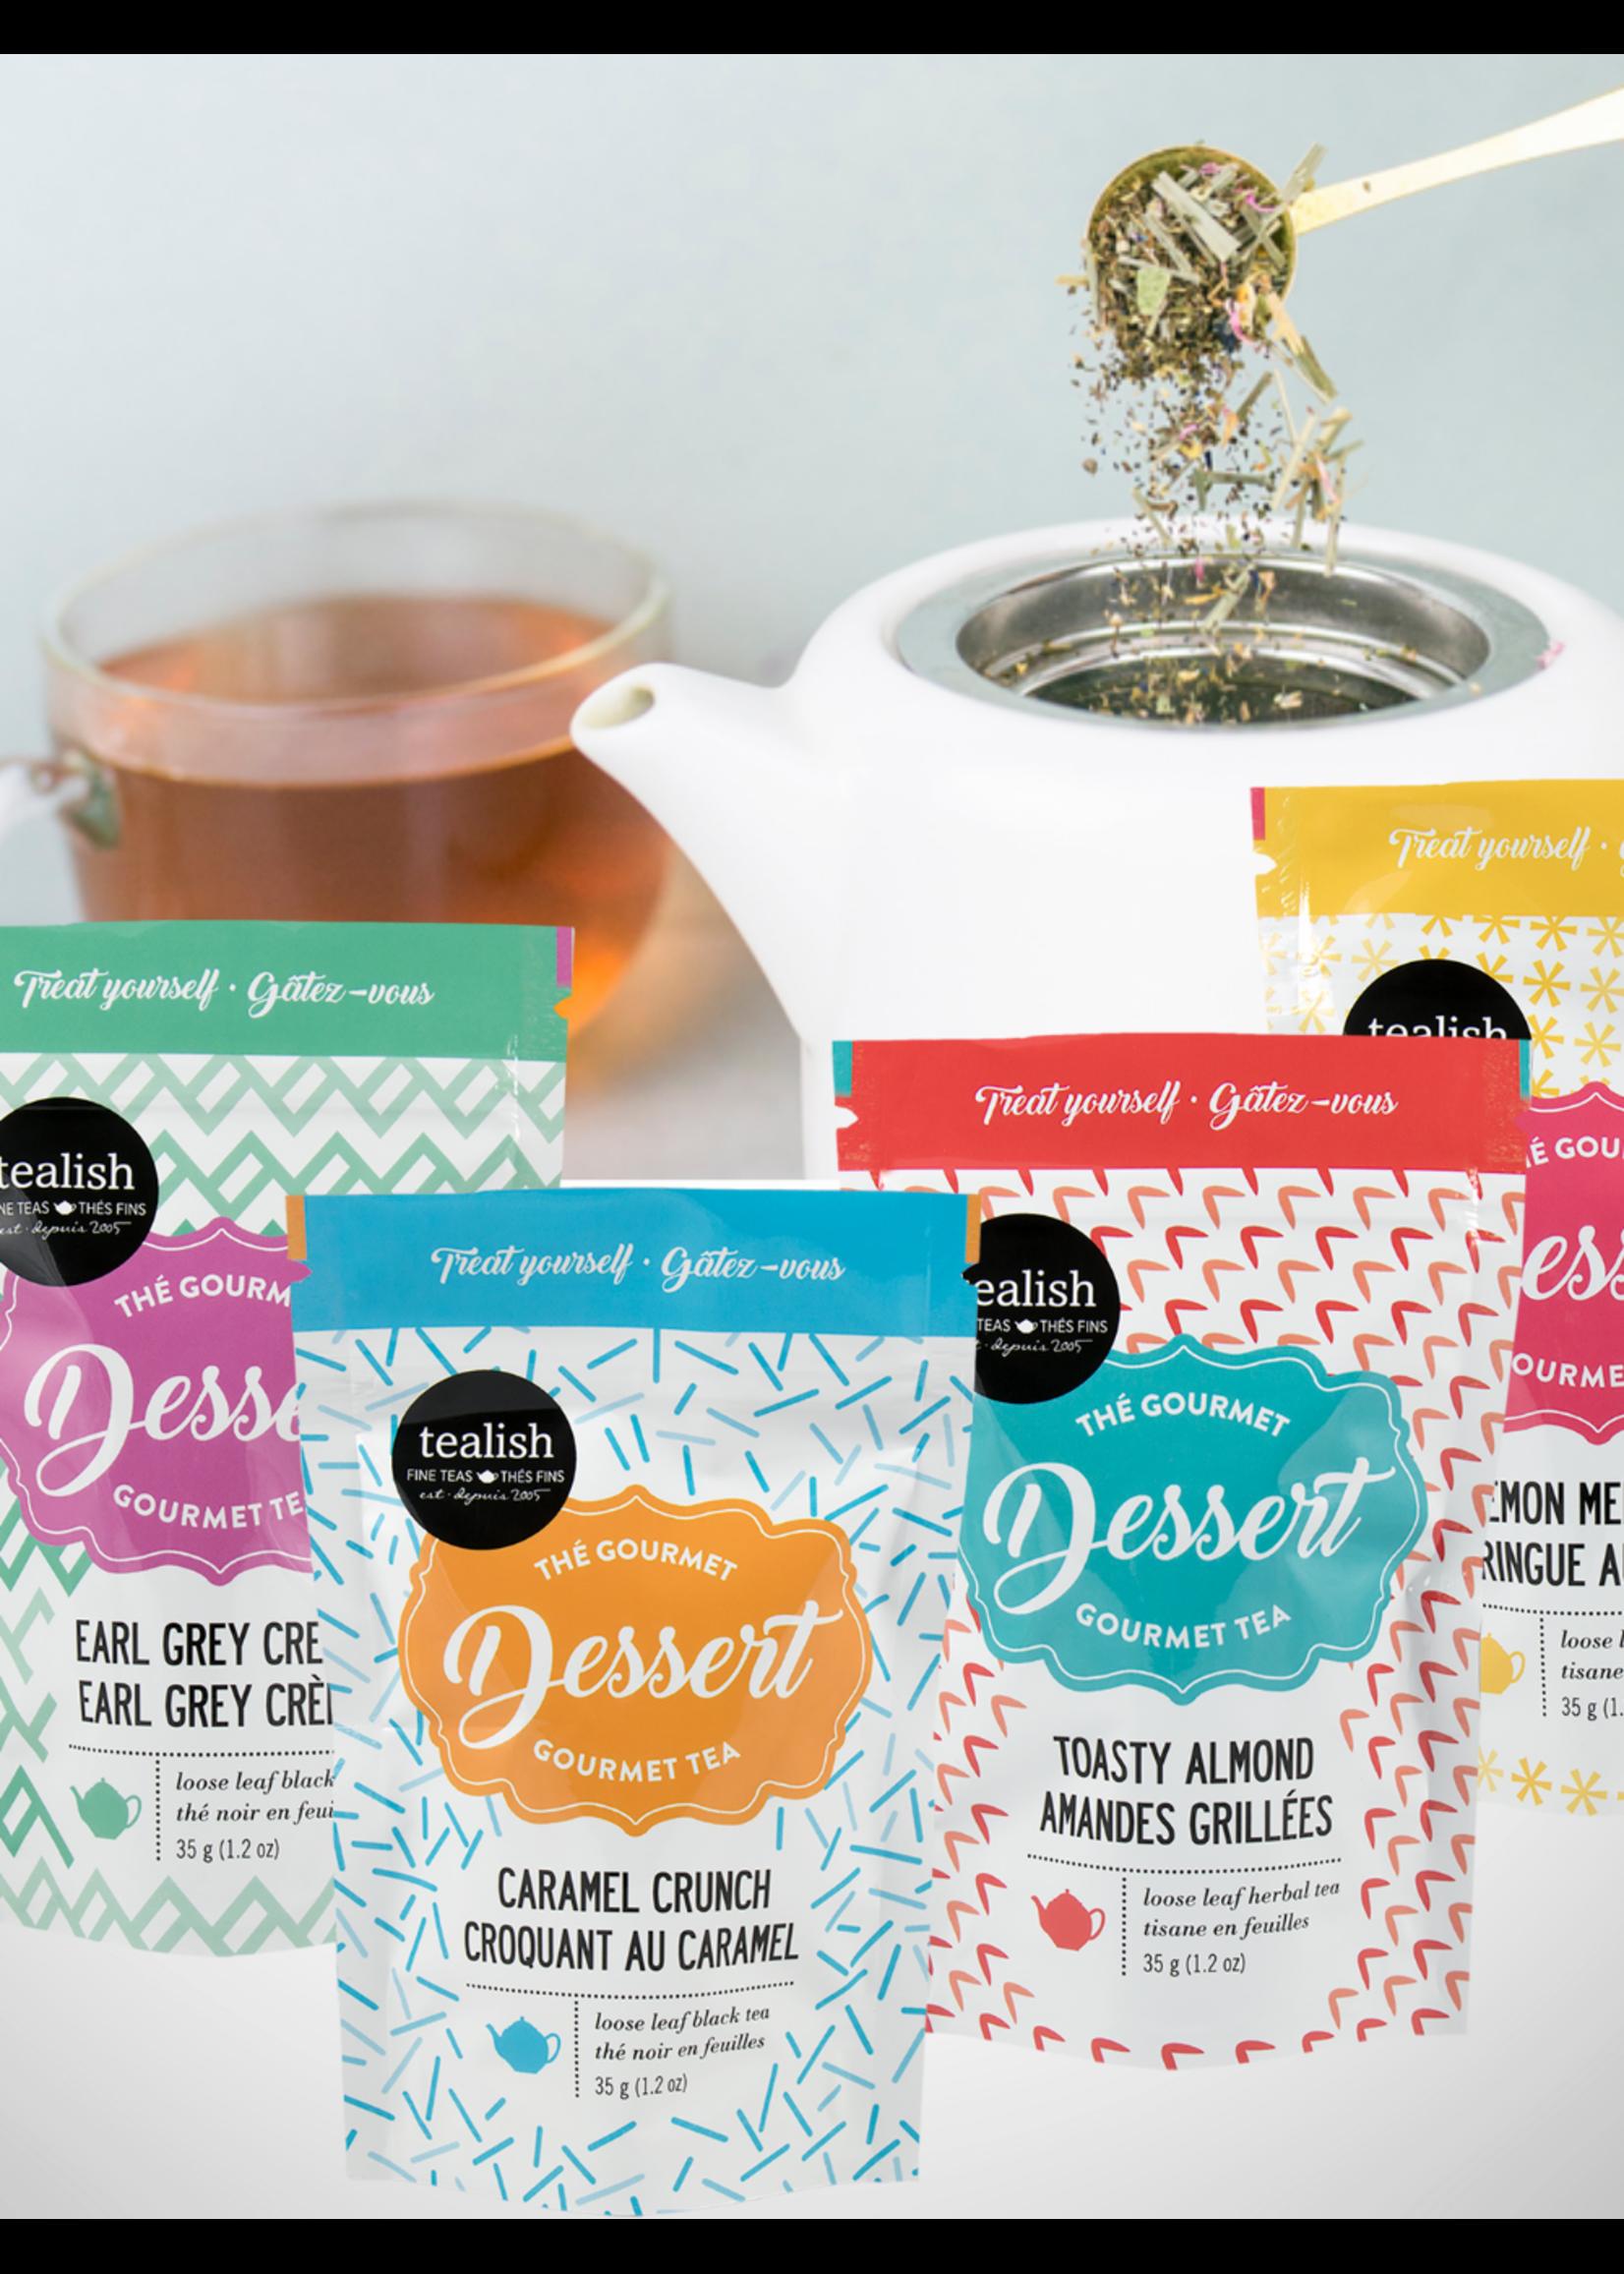 Tealish Dessert Teas 35g Pouch